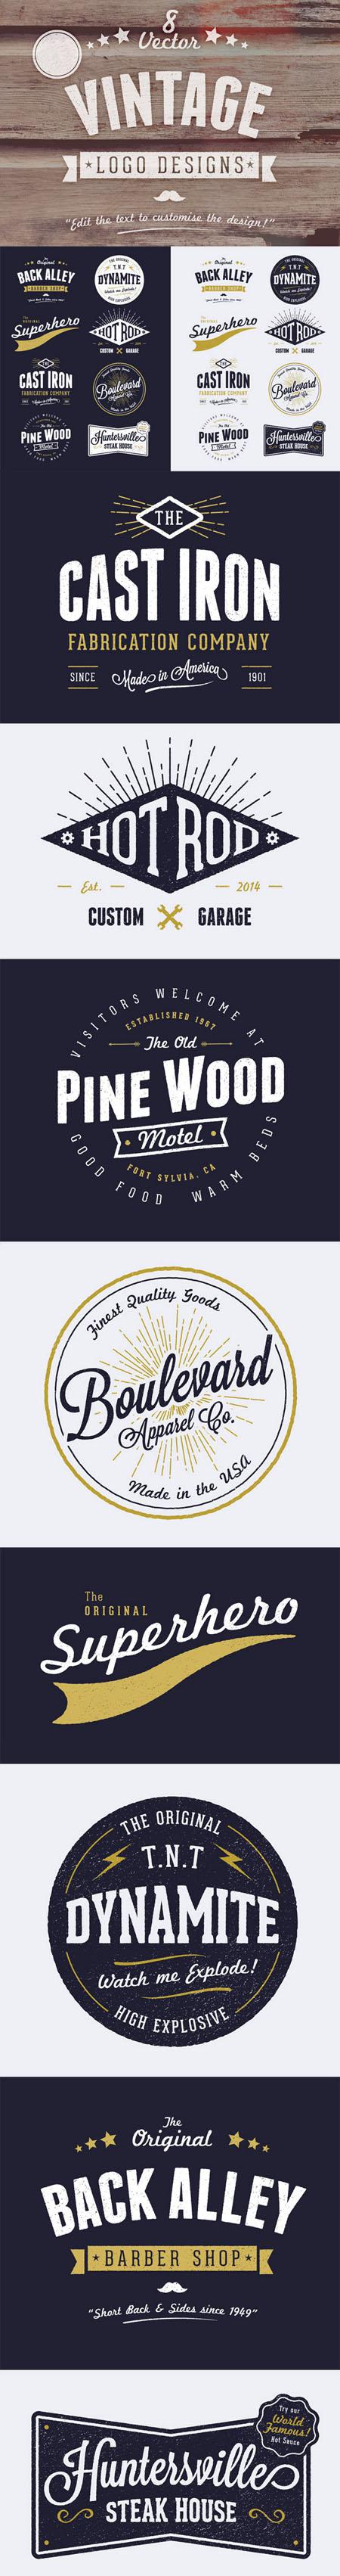 8 Customizable Vintage Style Logo Designs in Vector